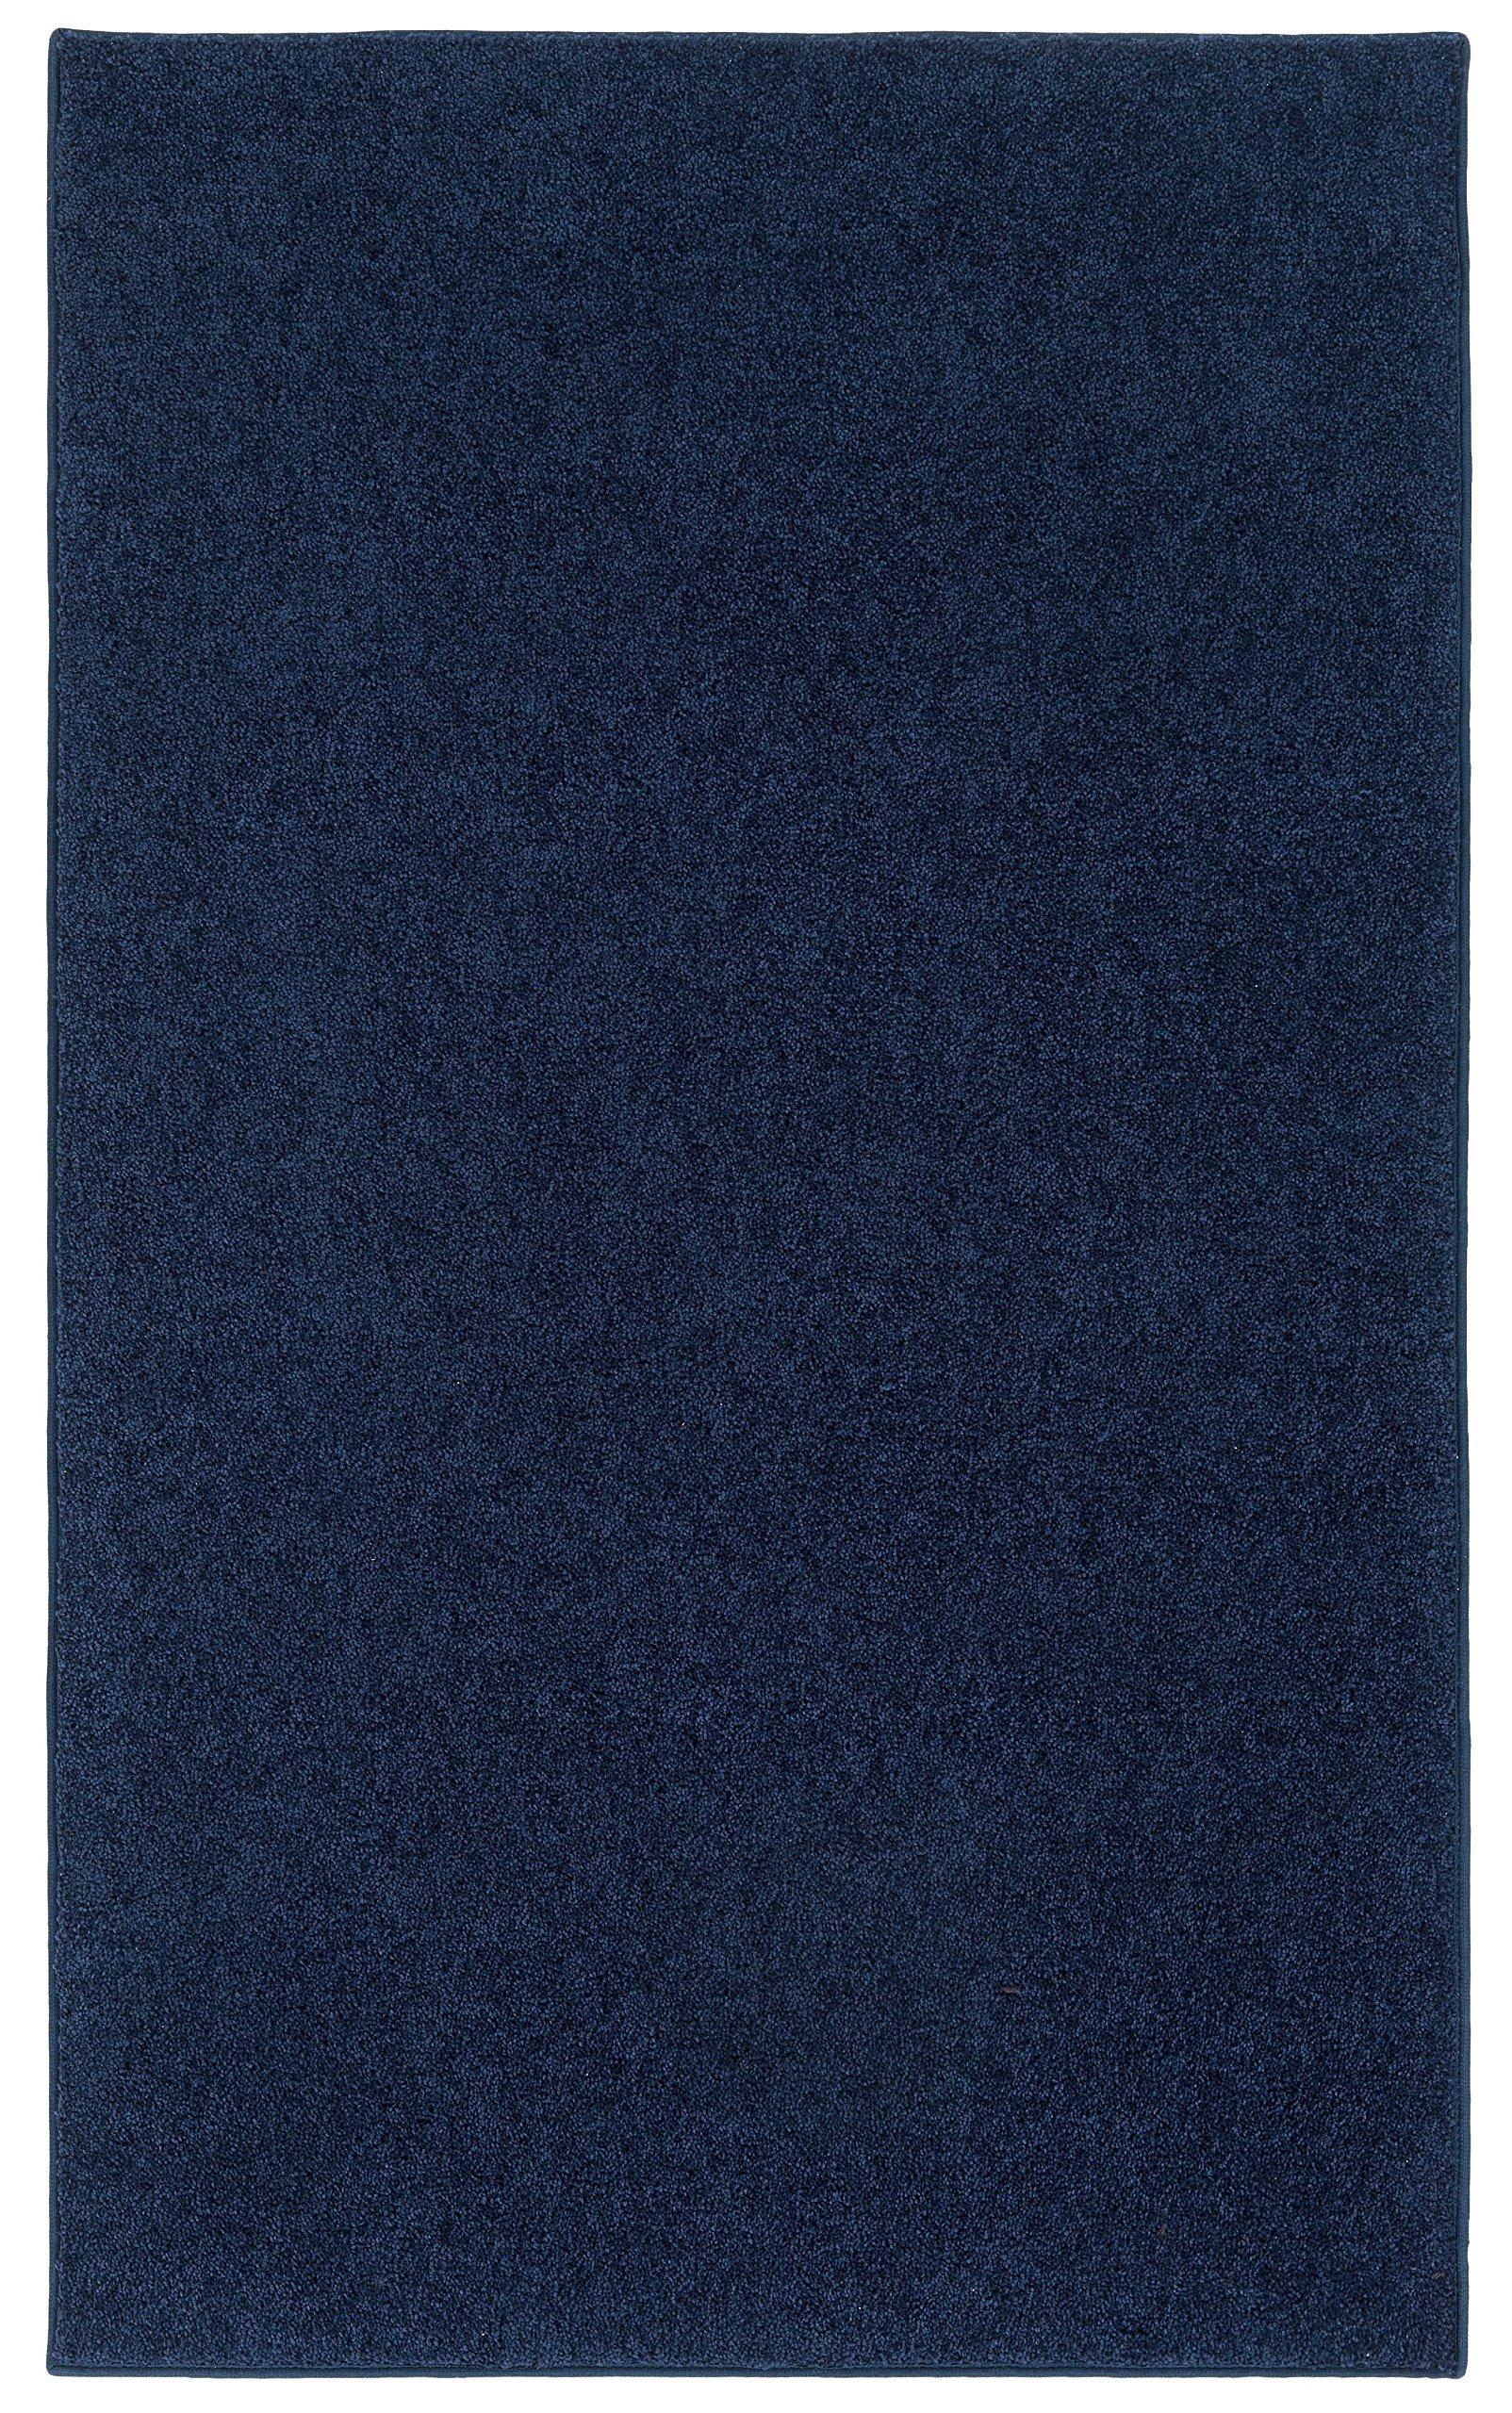 vintage x indoor safavieh dark outdoor ombre light of navy adirondack blue fresh new rug